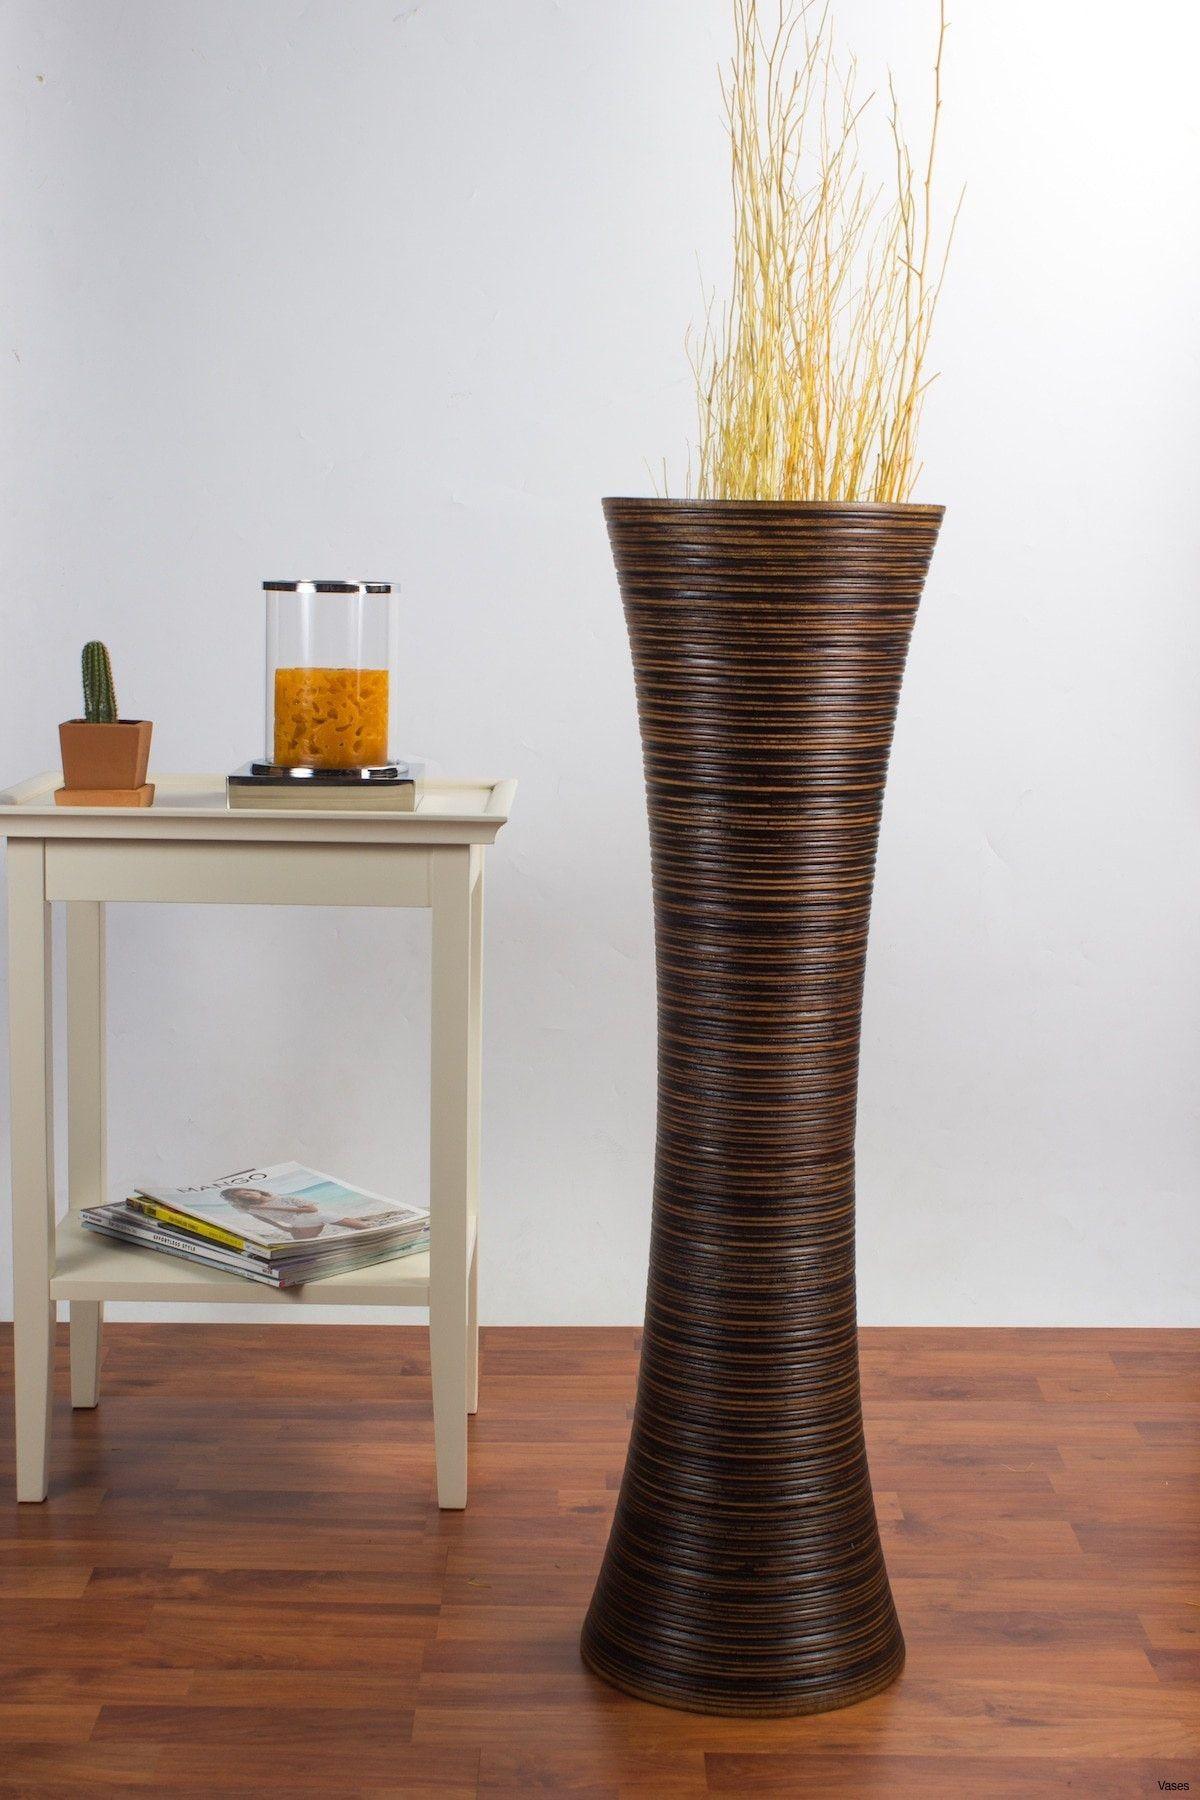 tall silver floor vase of tall decorative vases luxury decorative floor vases fresh d dkbrw with regard to tall decorative vases luxury decorative floor vases fresh d dkbrw 5749 1h vases tall brown i